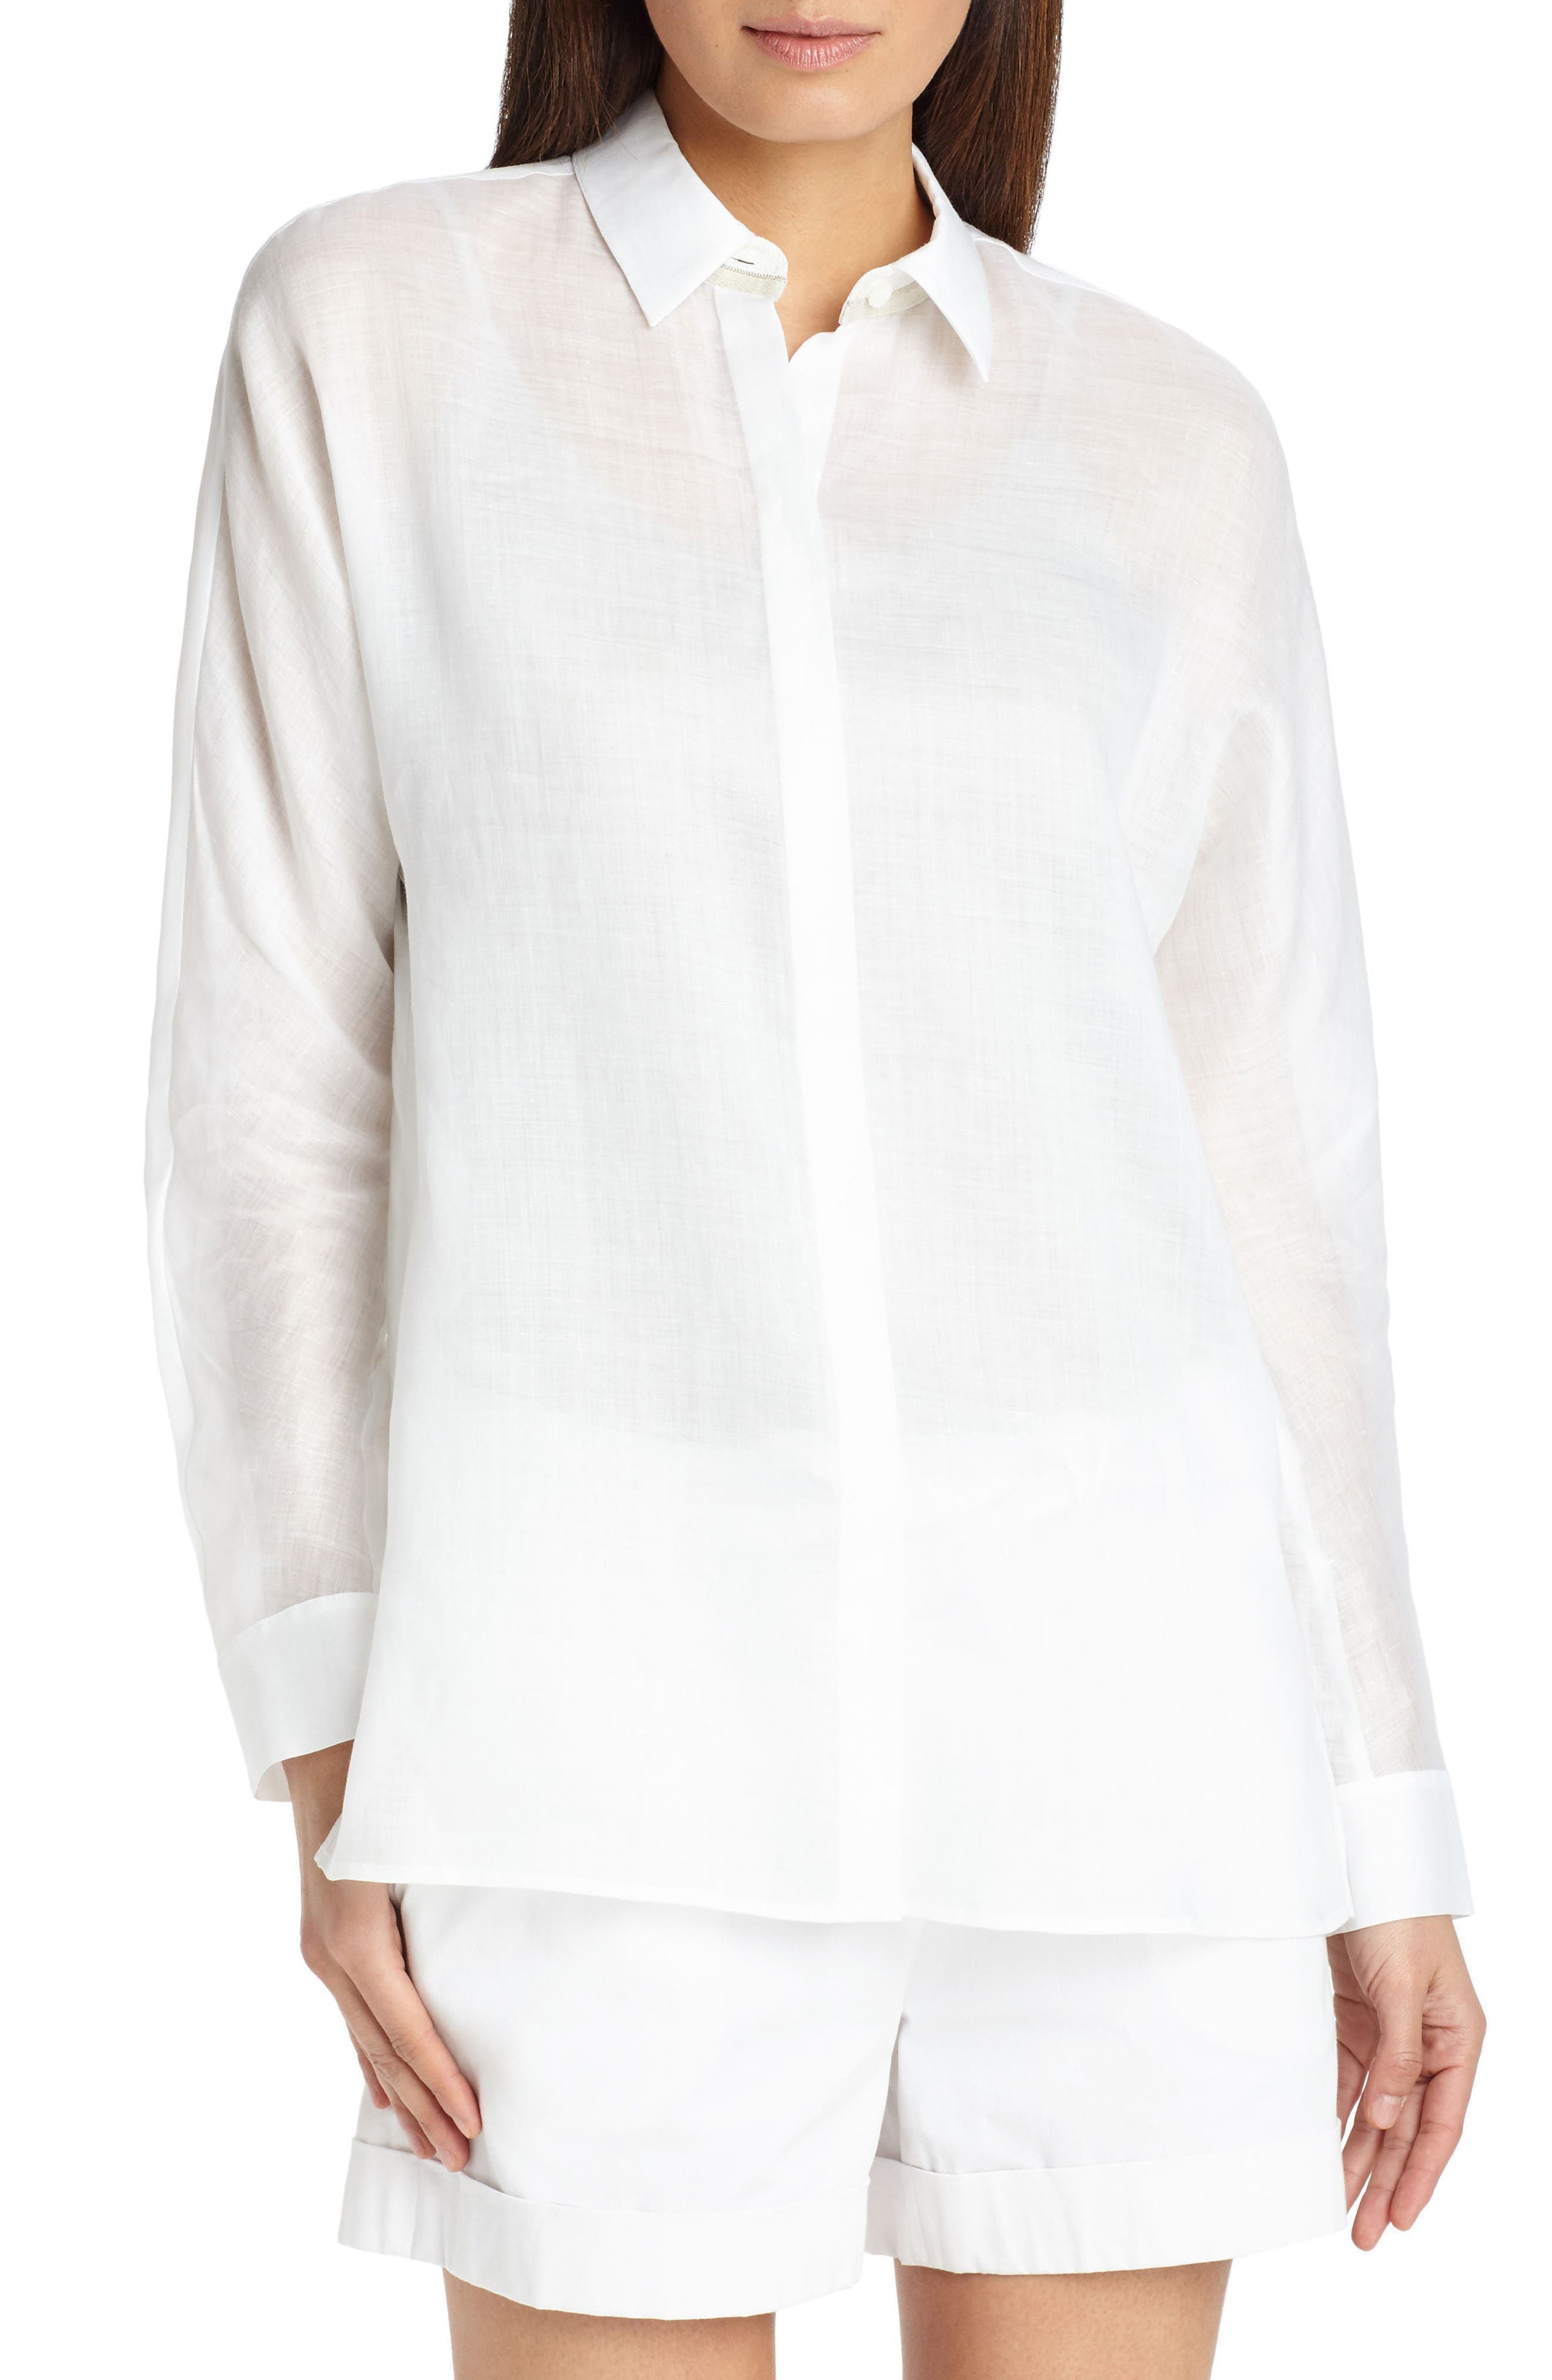 Alyssa Gemma Cloth Blouse,                         Main,                         color,